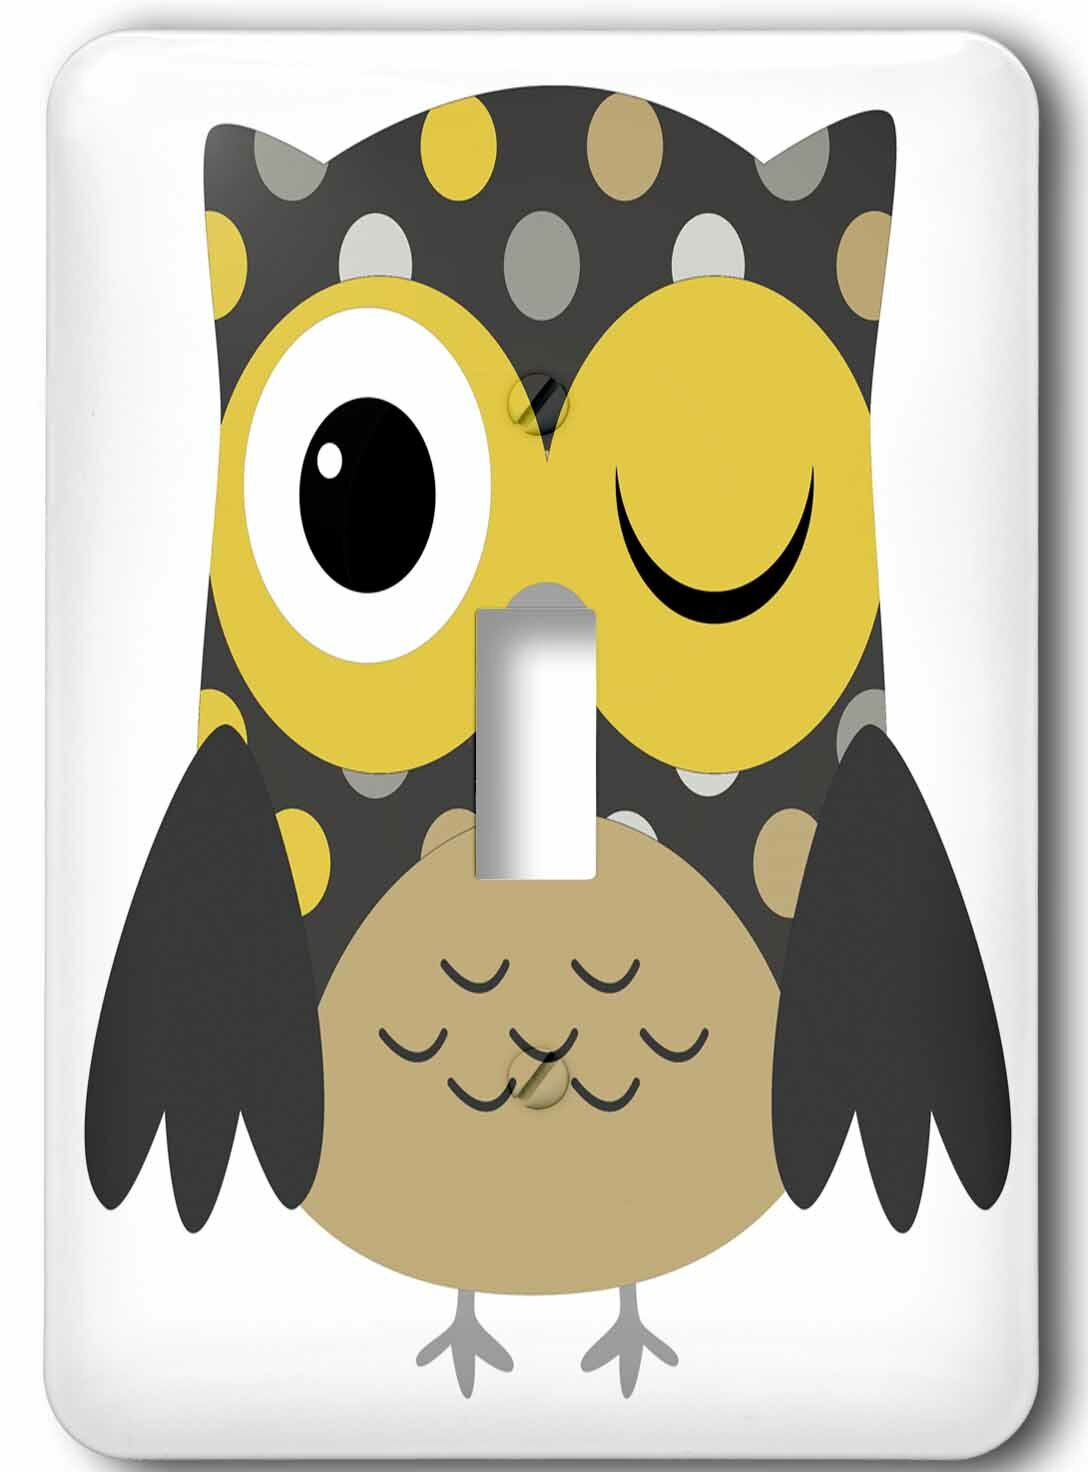 3drose Cute Owl 1 Gang Toggle Light Switch Wall Plate Wayfair